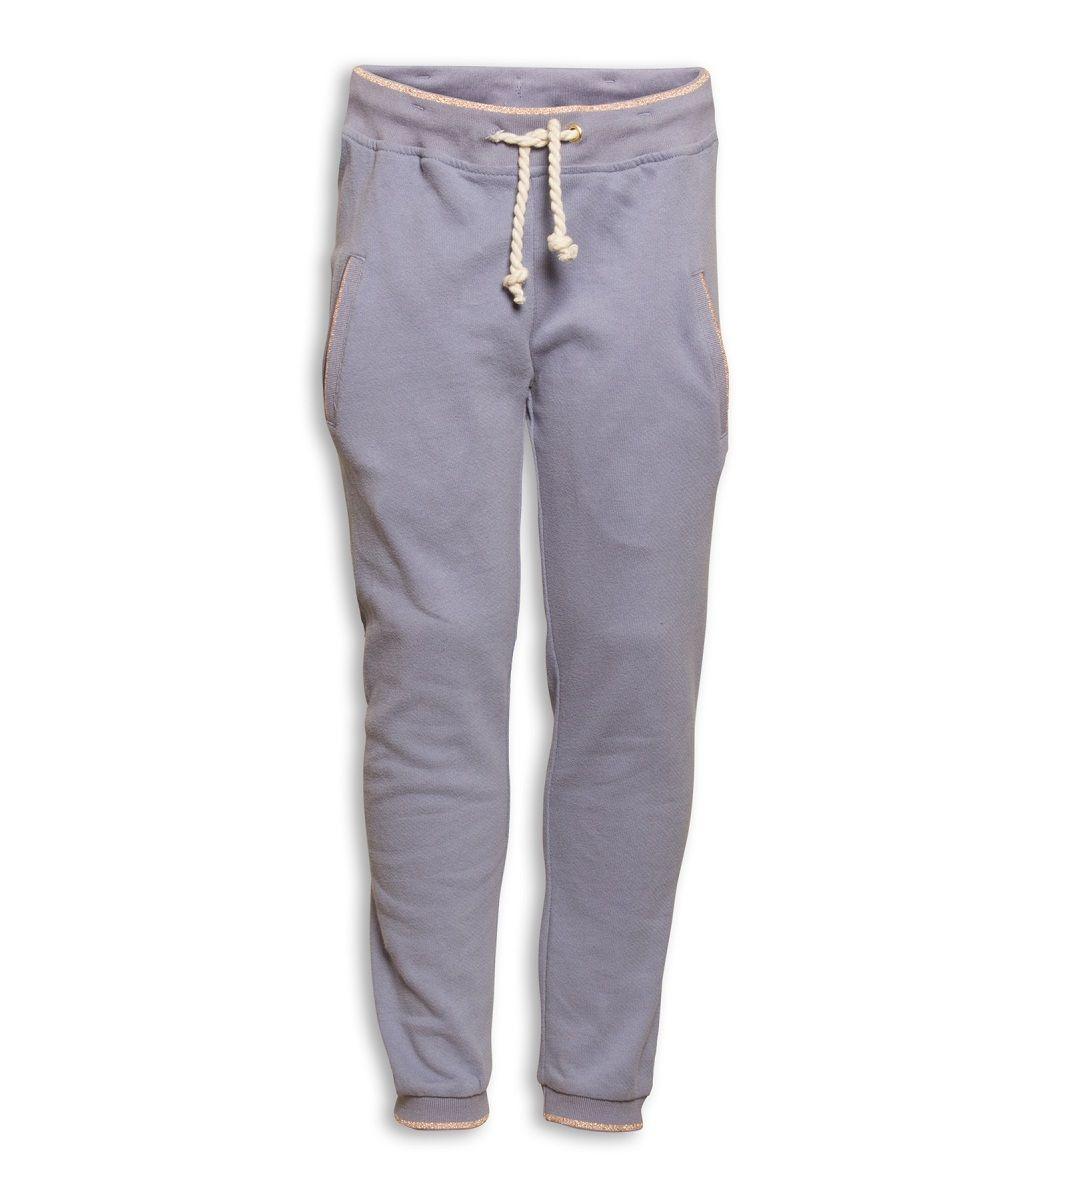 American Outfitters Fleece Pants | www.littlesahou.com